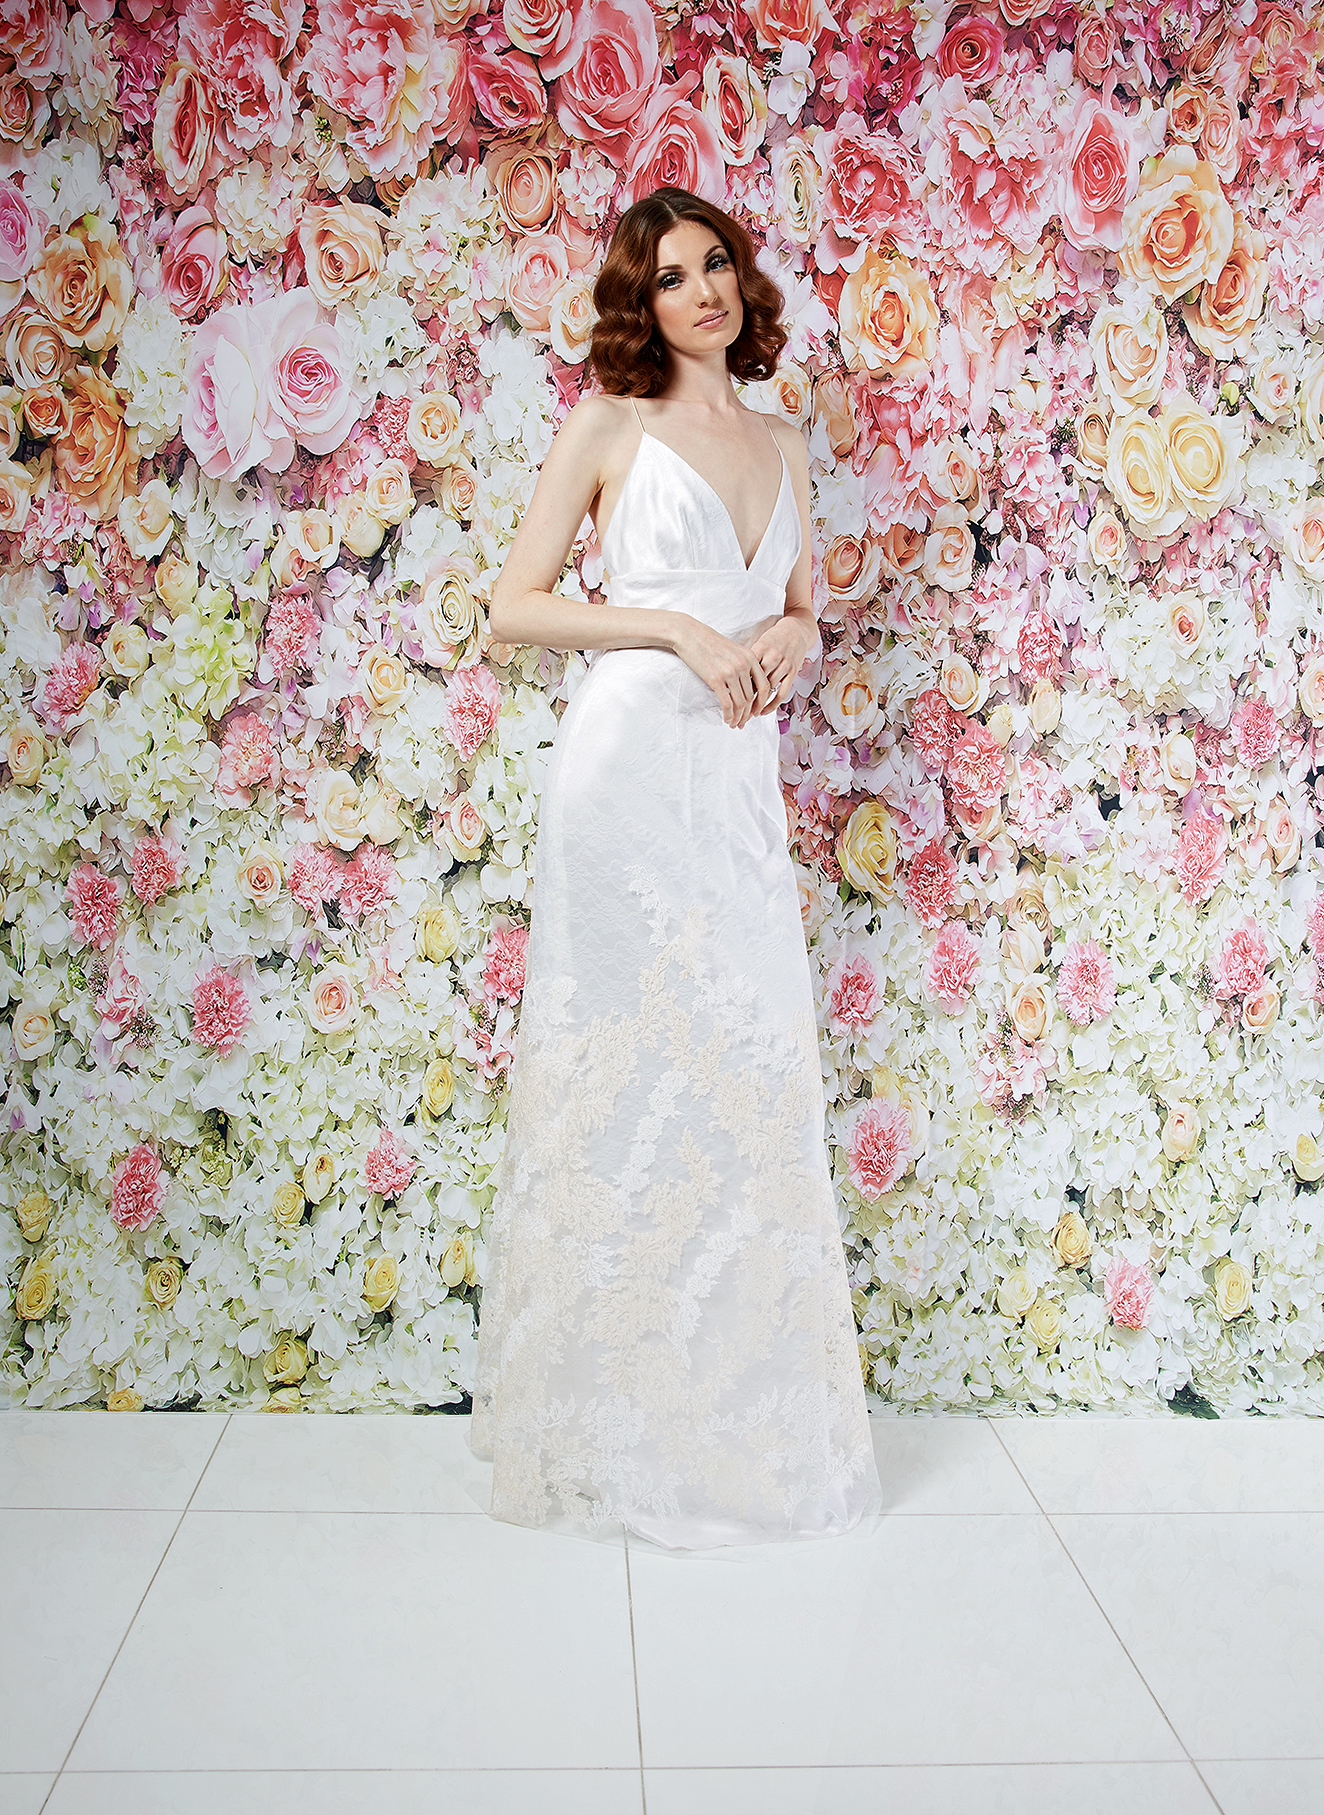 randi rahm wedding dress spring 2019 spaghetti-strap embroidered sheath